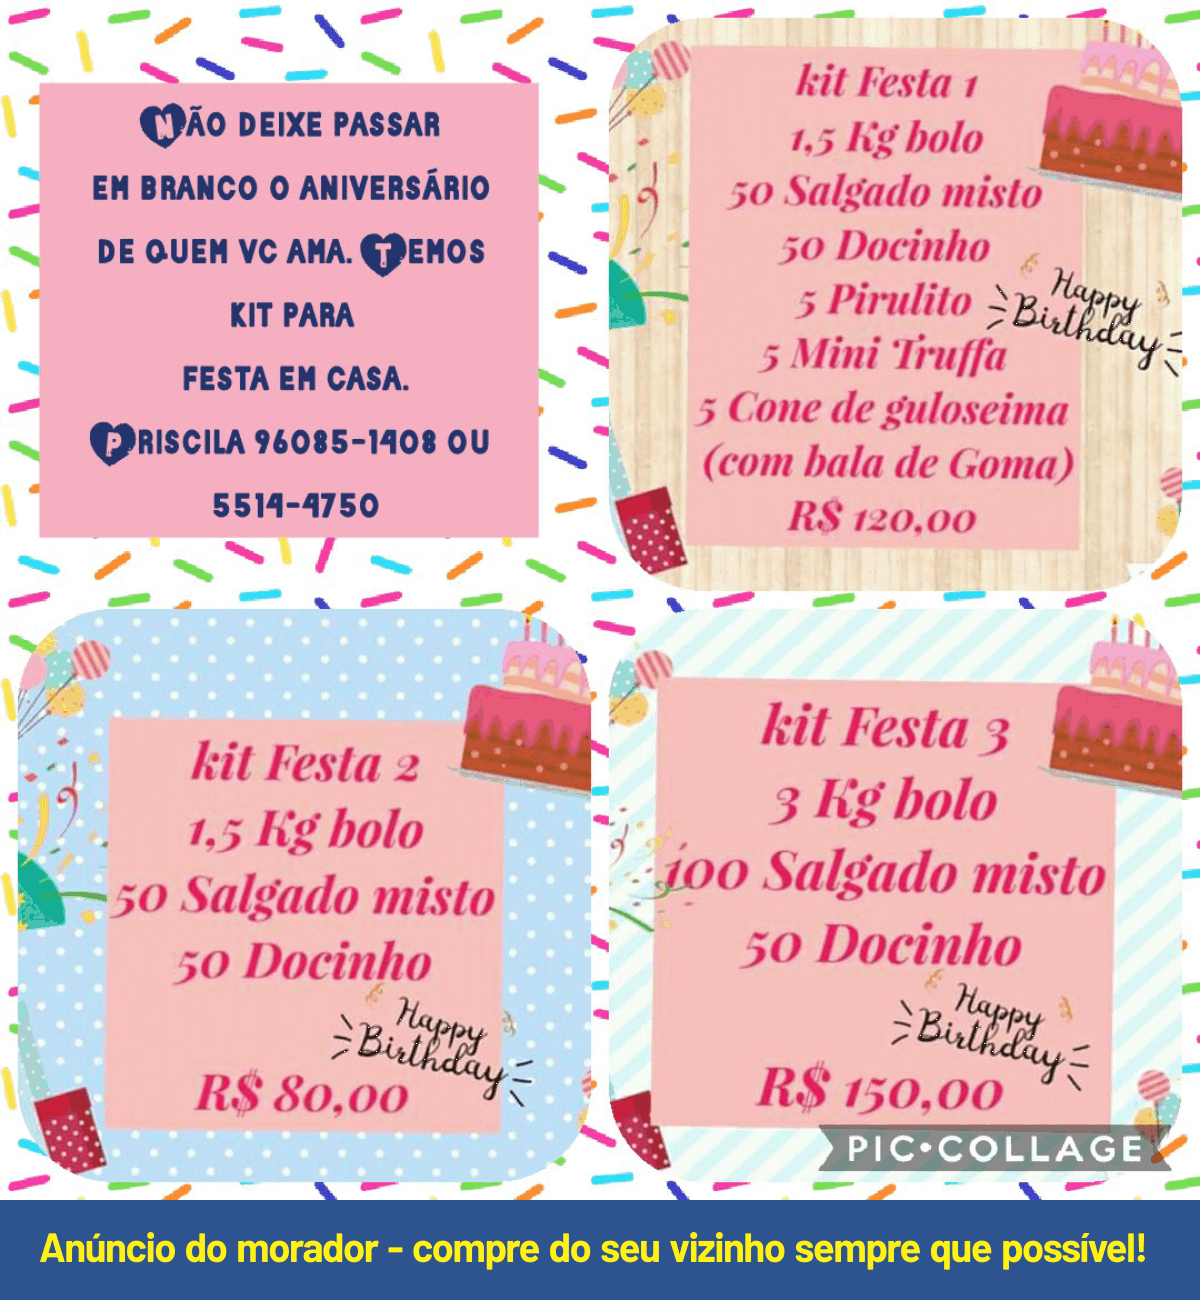 KIT FESTAS - Tatiana.png